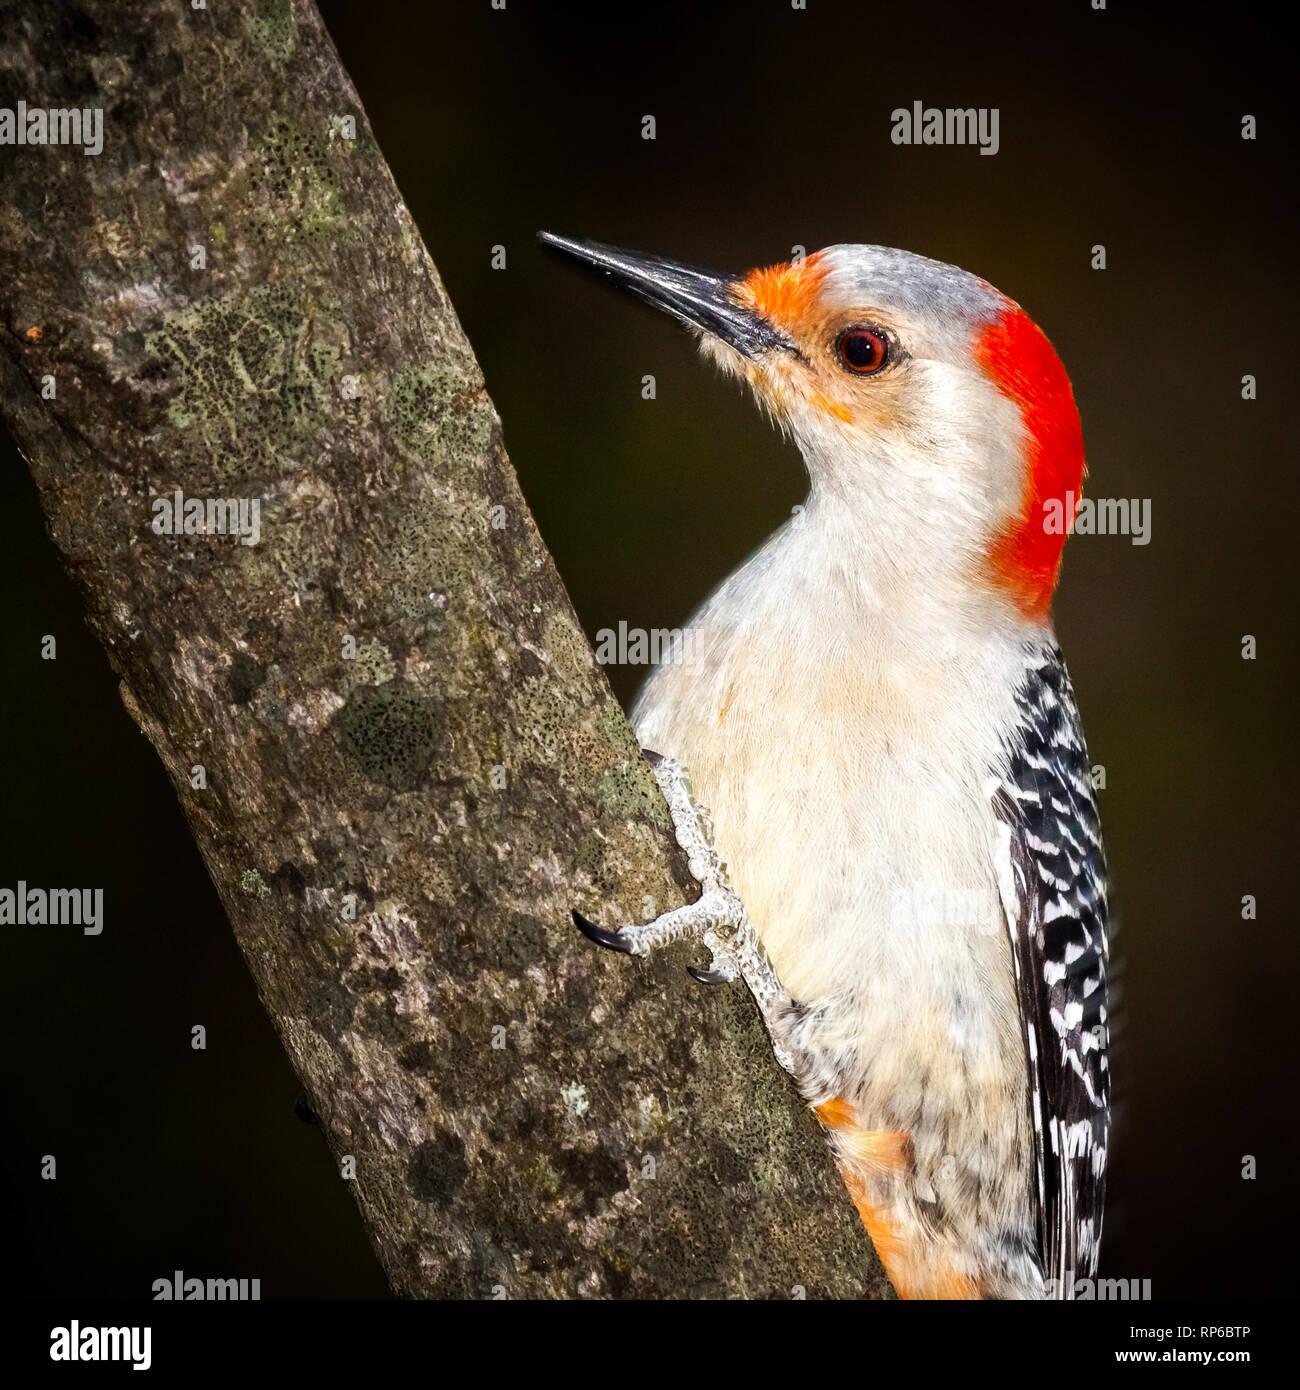 Male Downy Woodpecker - Stock Image